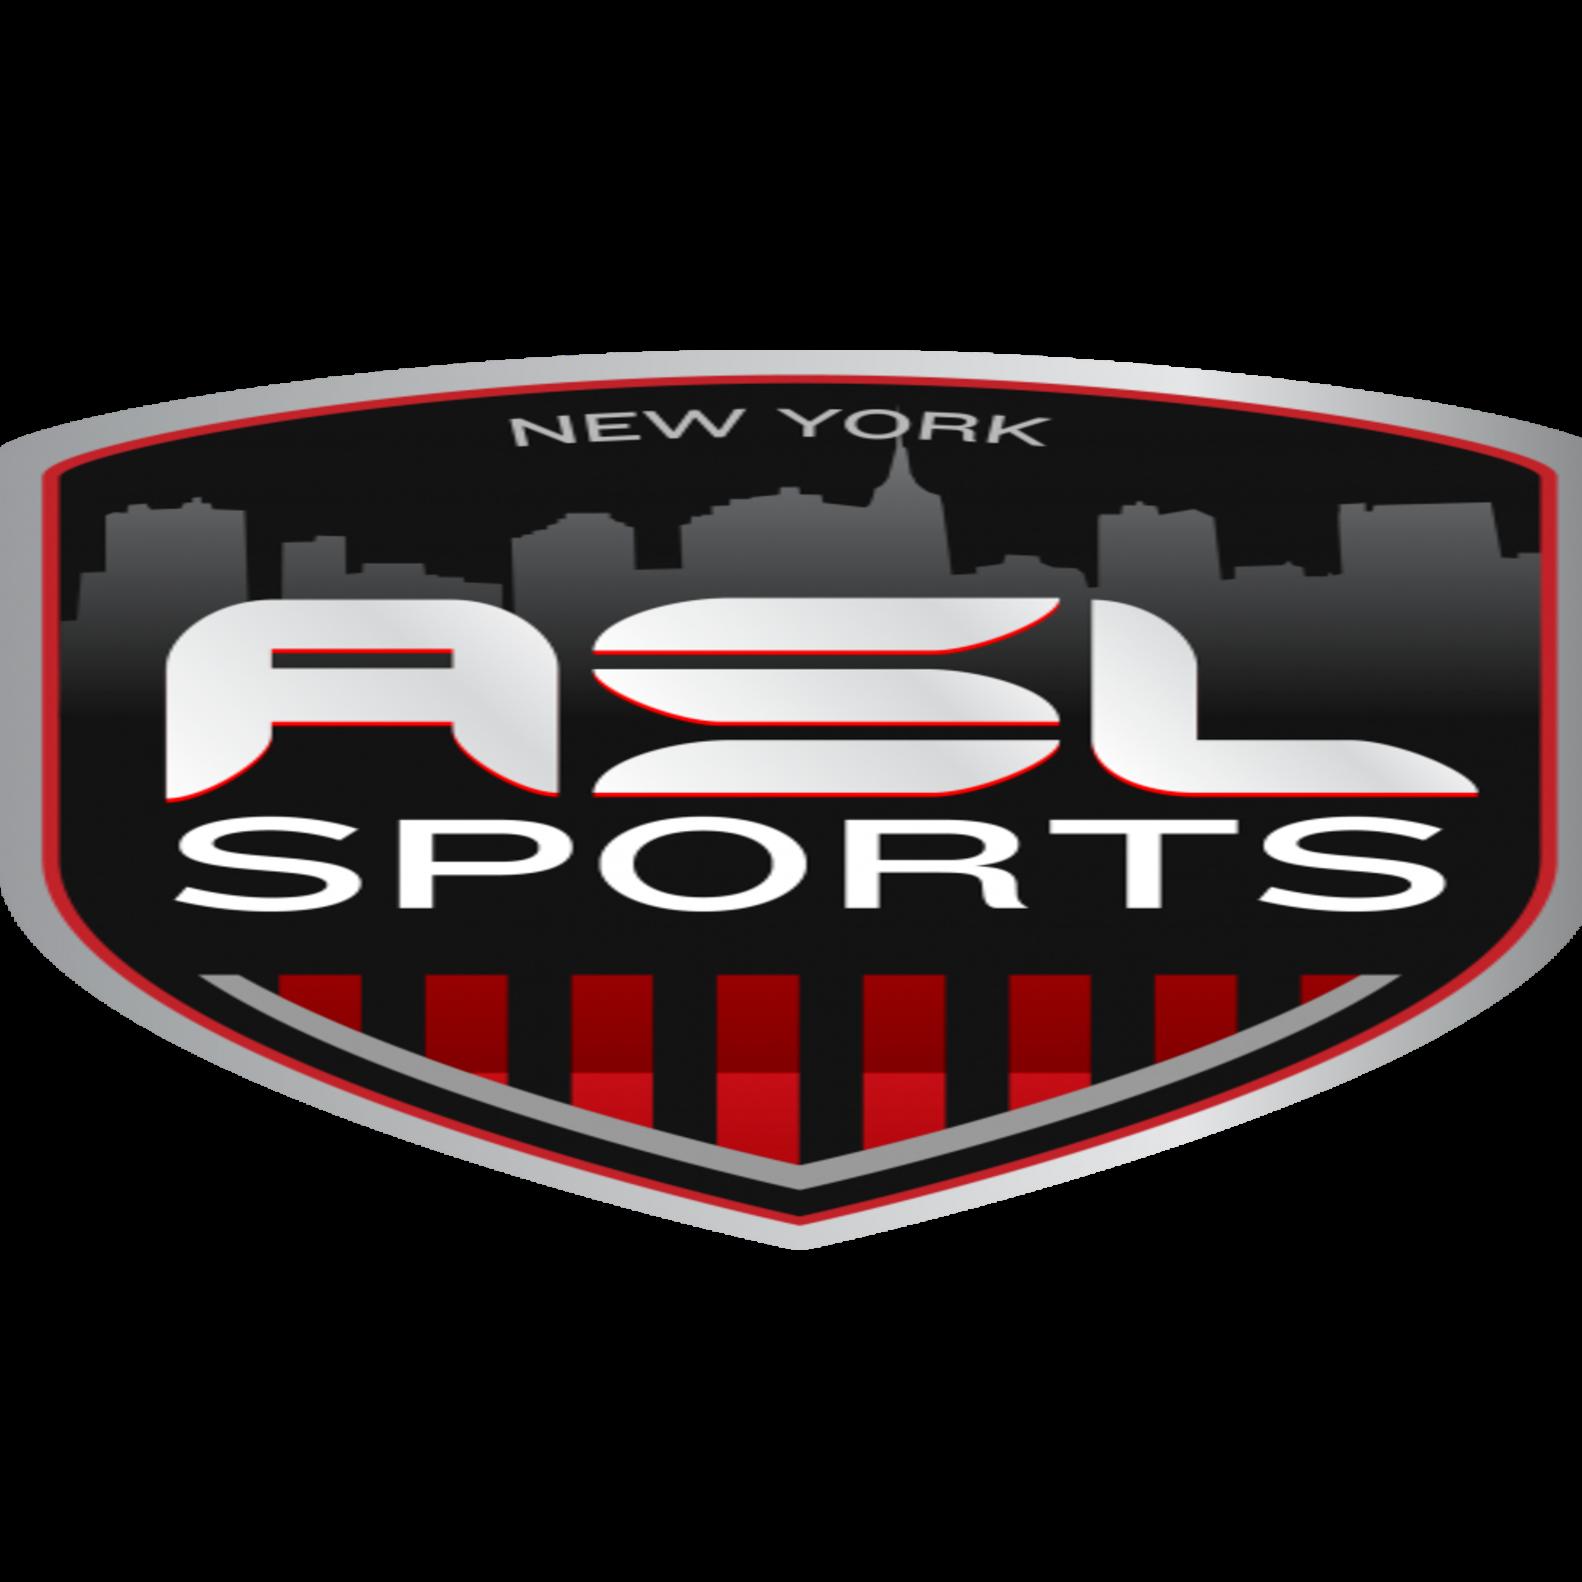 ASL Sports - Fairfield, NJ 07004 - (718)684-1187 | ShowMeLocal.com